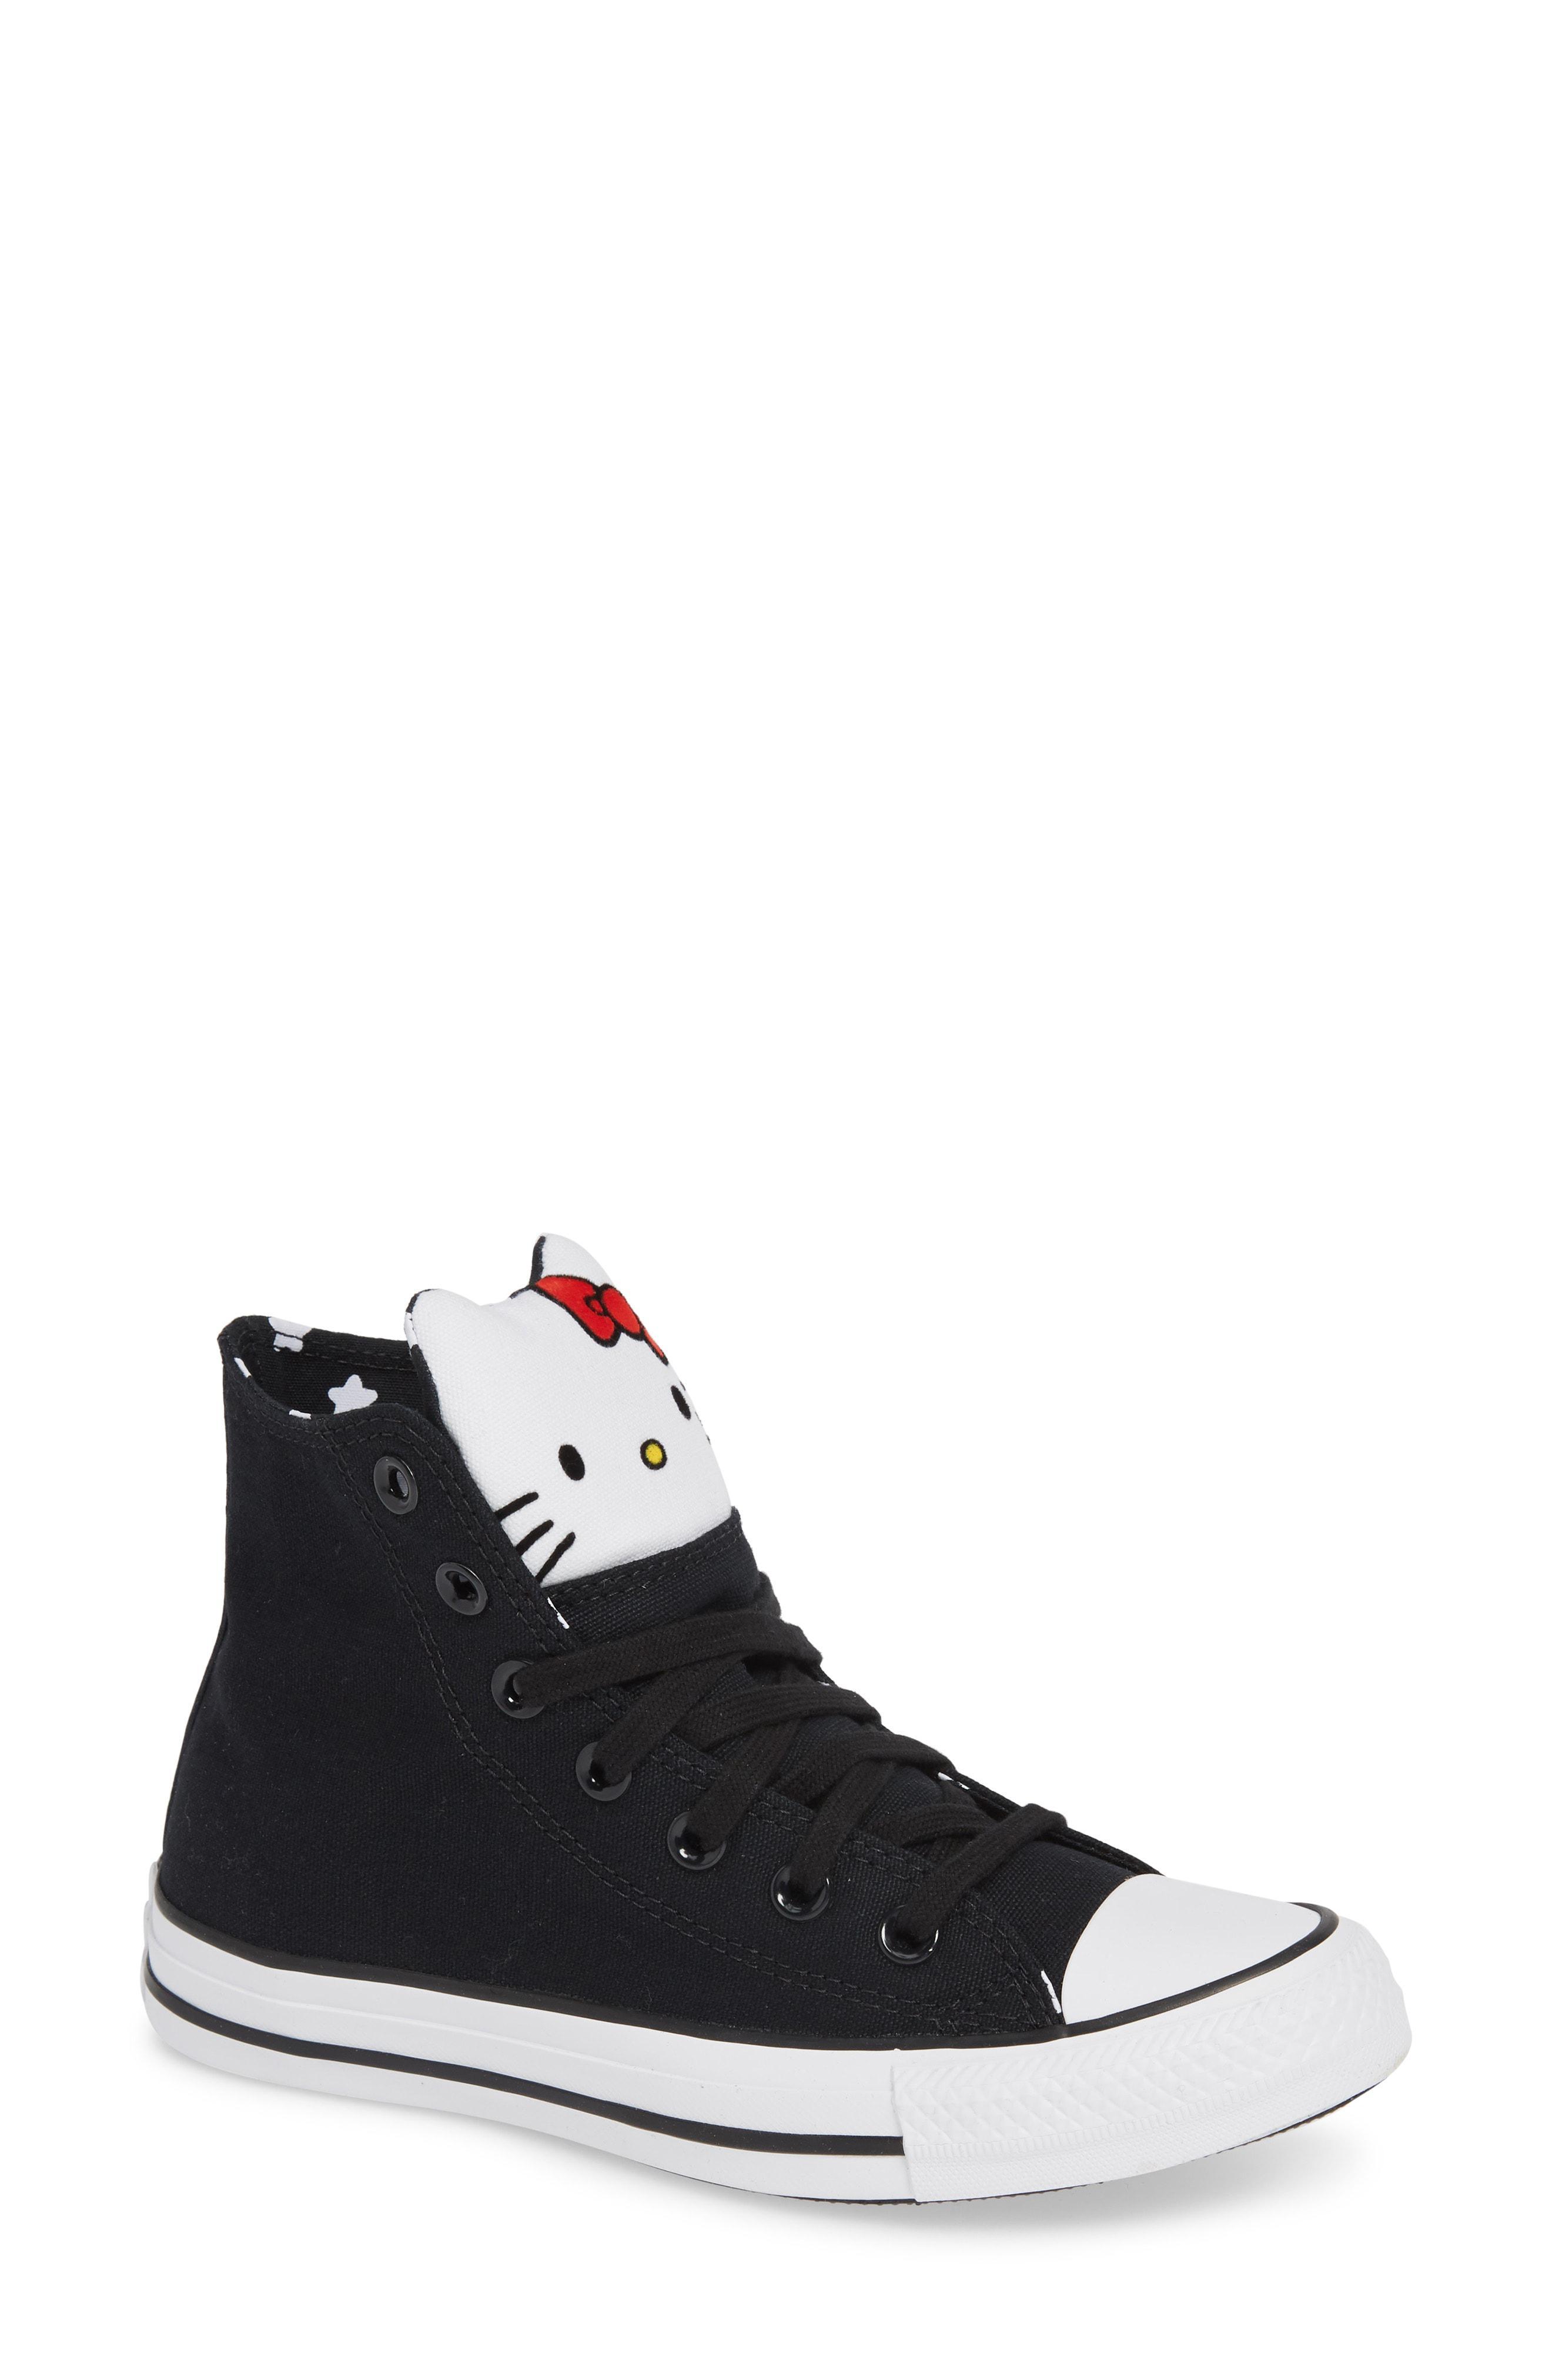 4d18116a4d05e6 Converse. Women s Black X Hello Kitty Chuck Taylor All Star High Top Sneaker